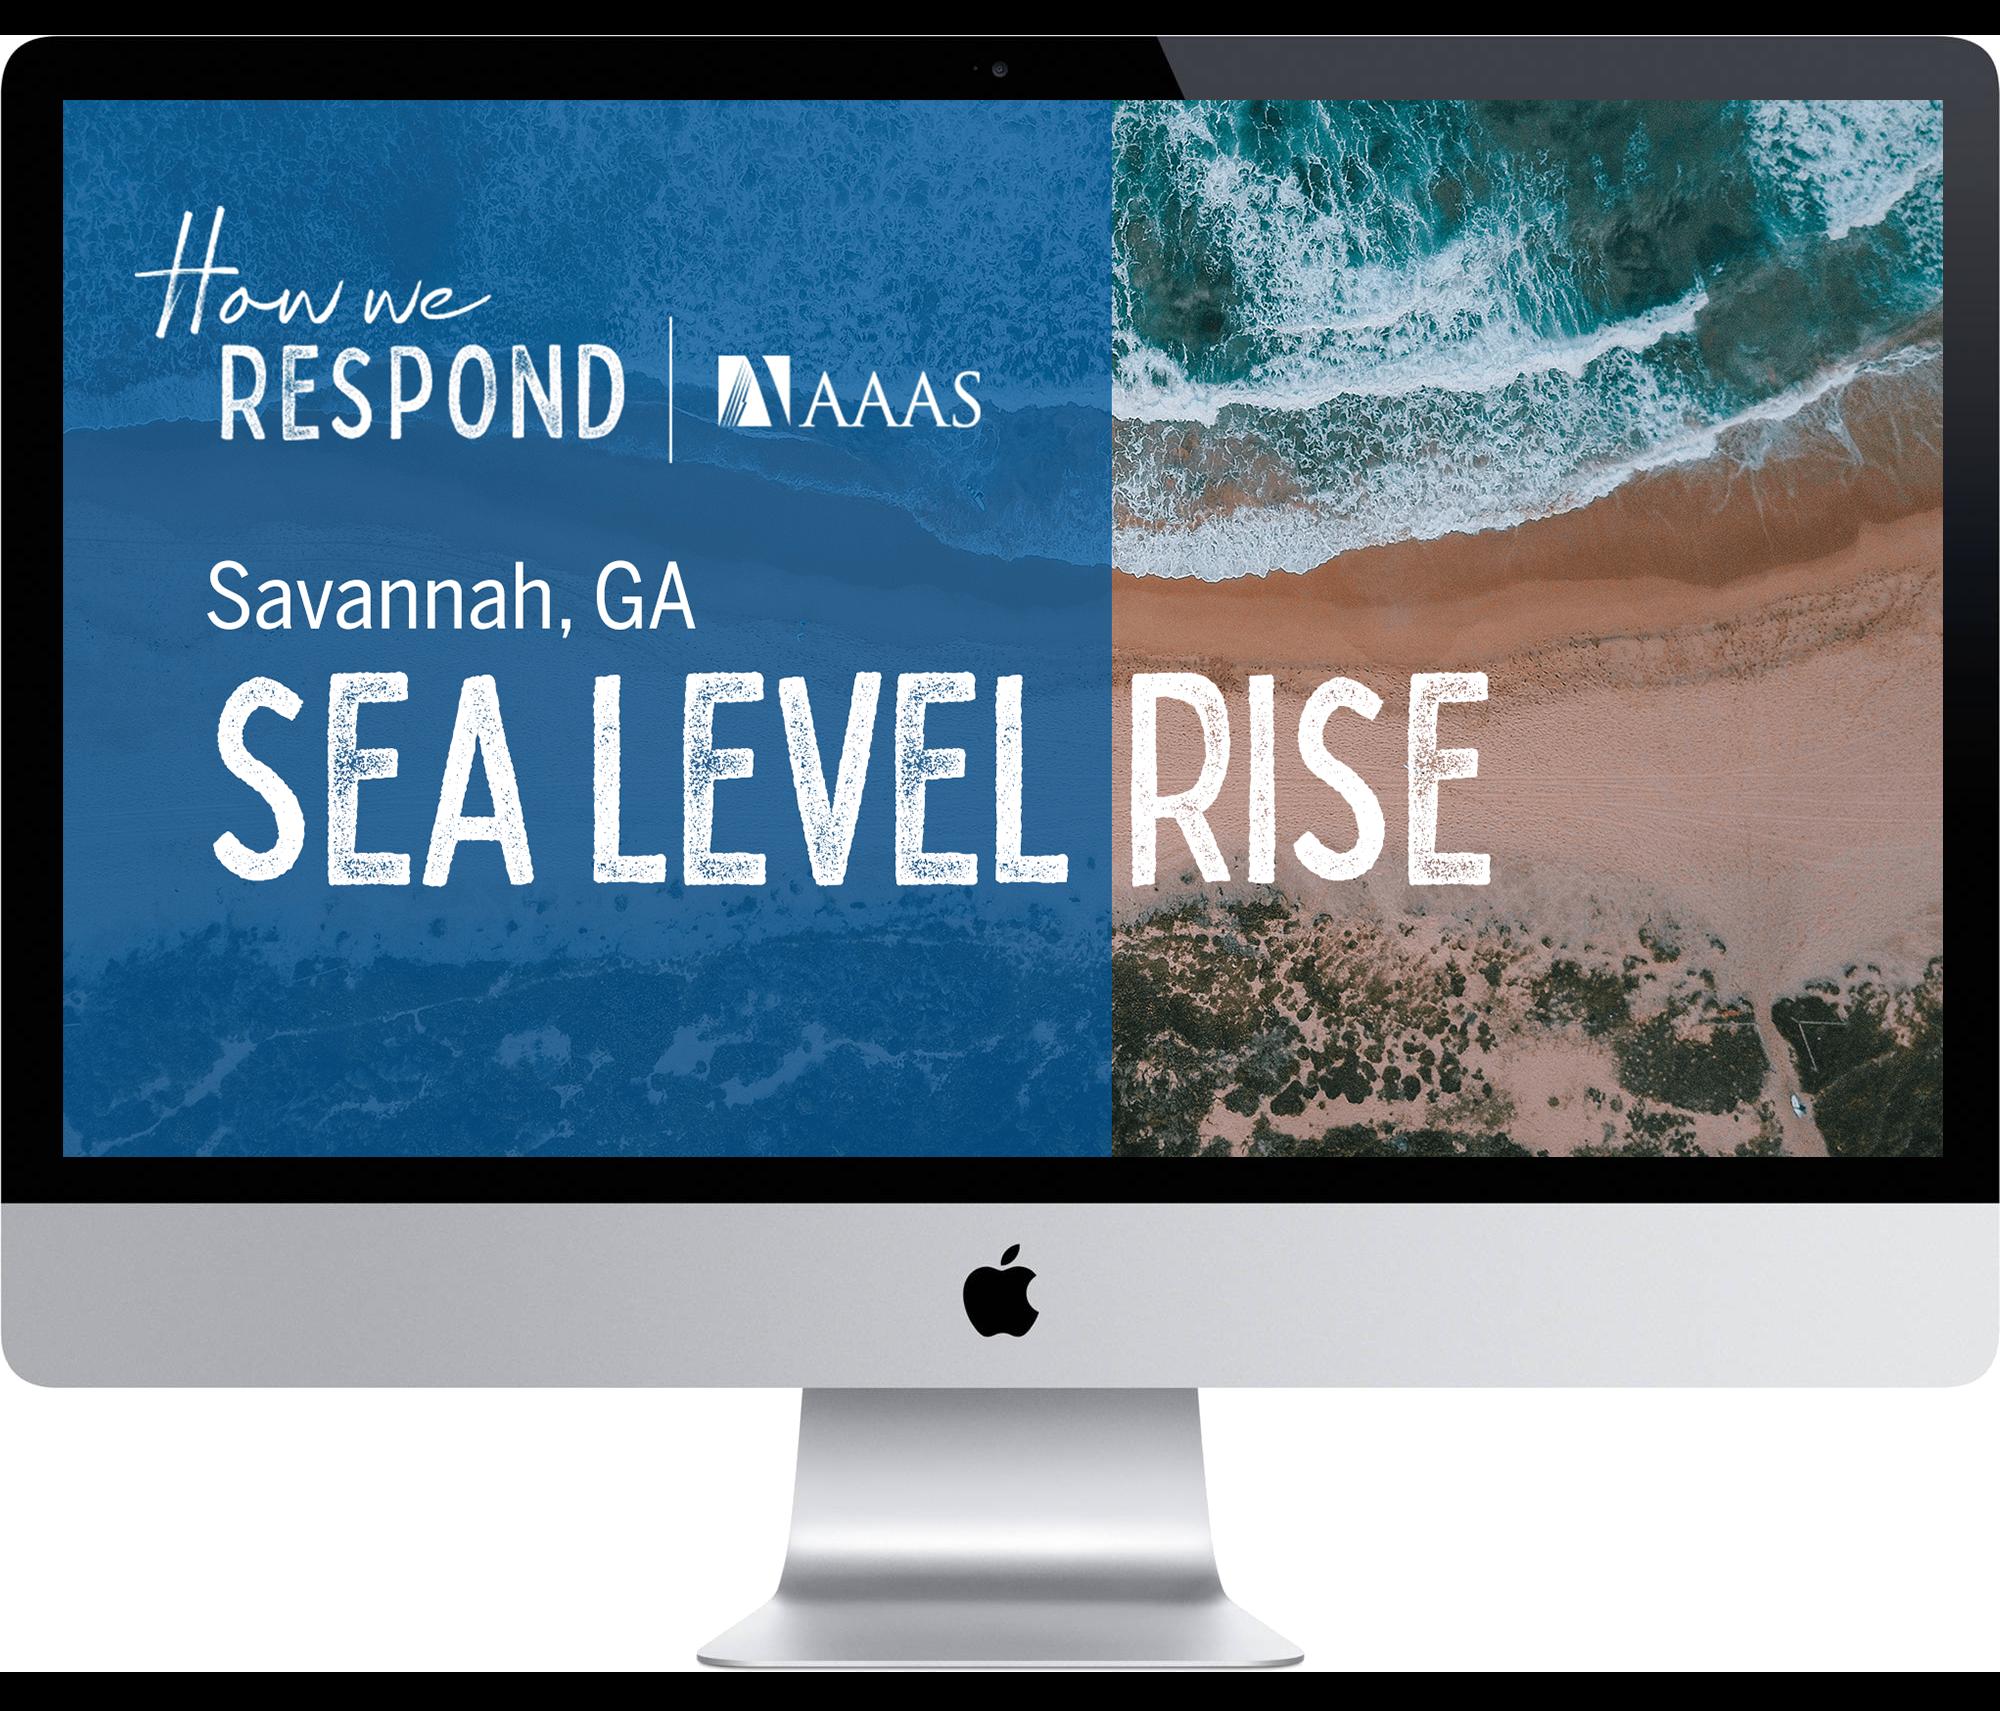 Savannah, GA - Sea level rise